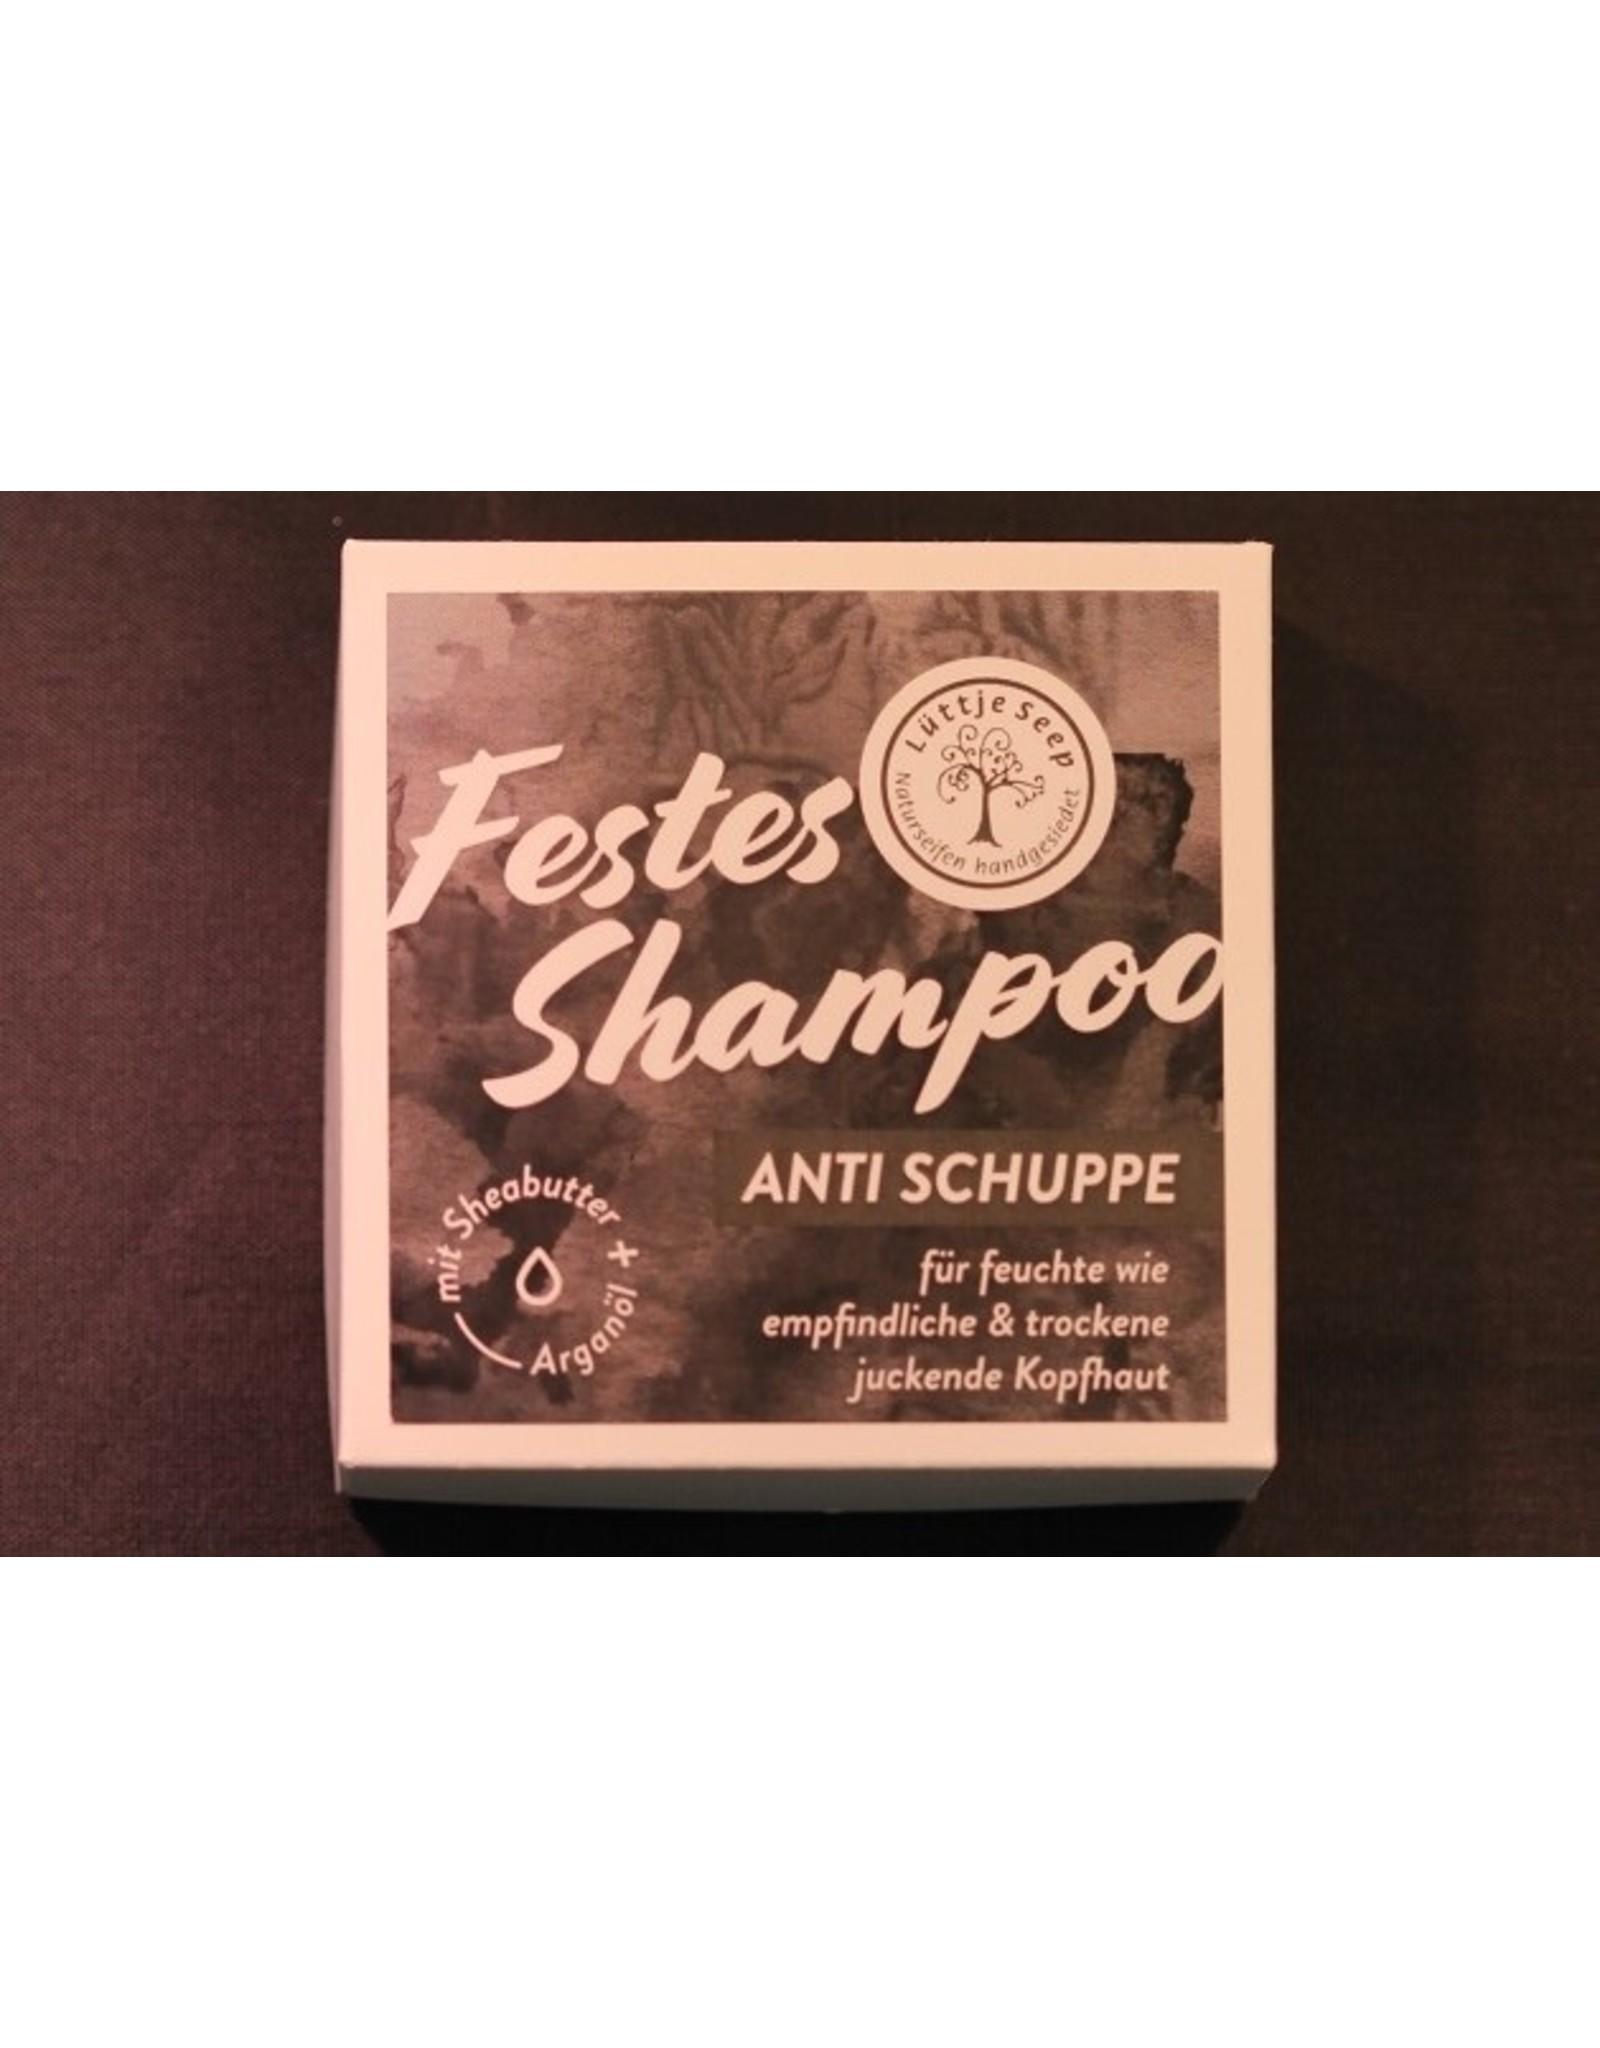 Festes Shampoo  - Anti Schuppe